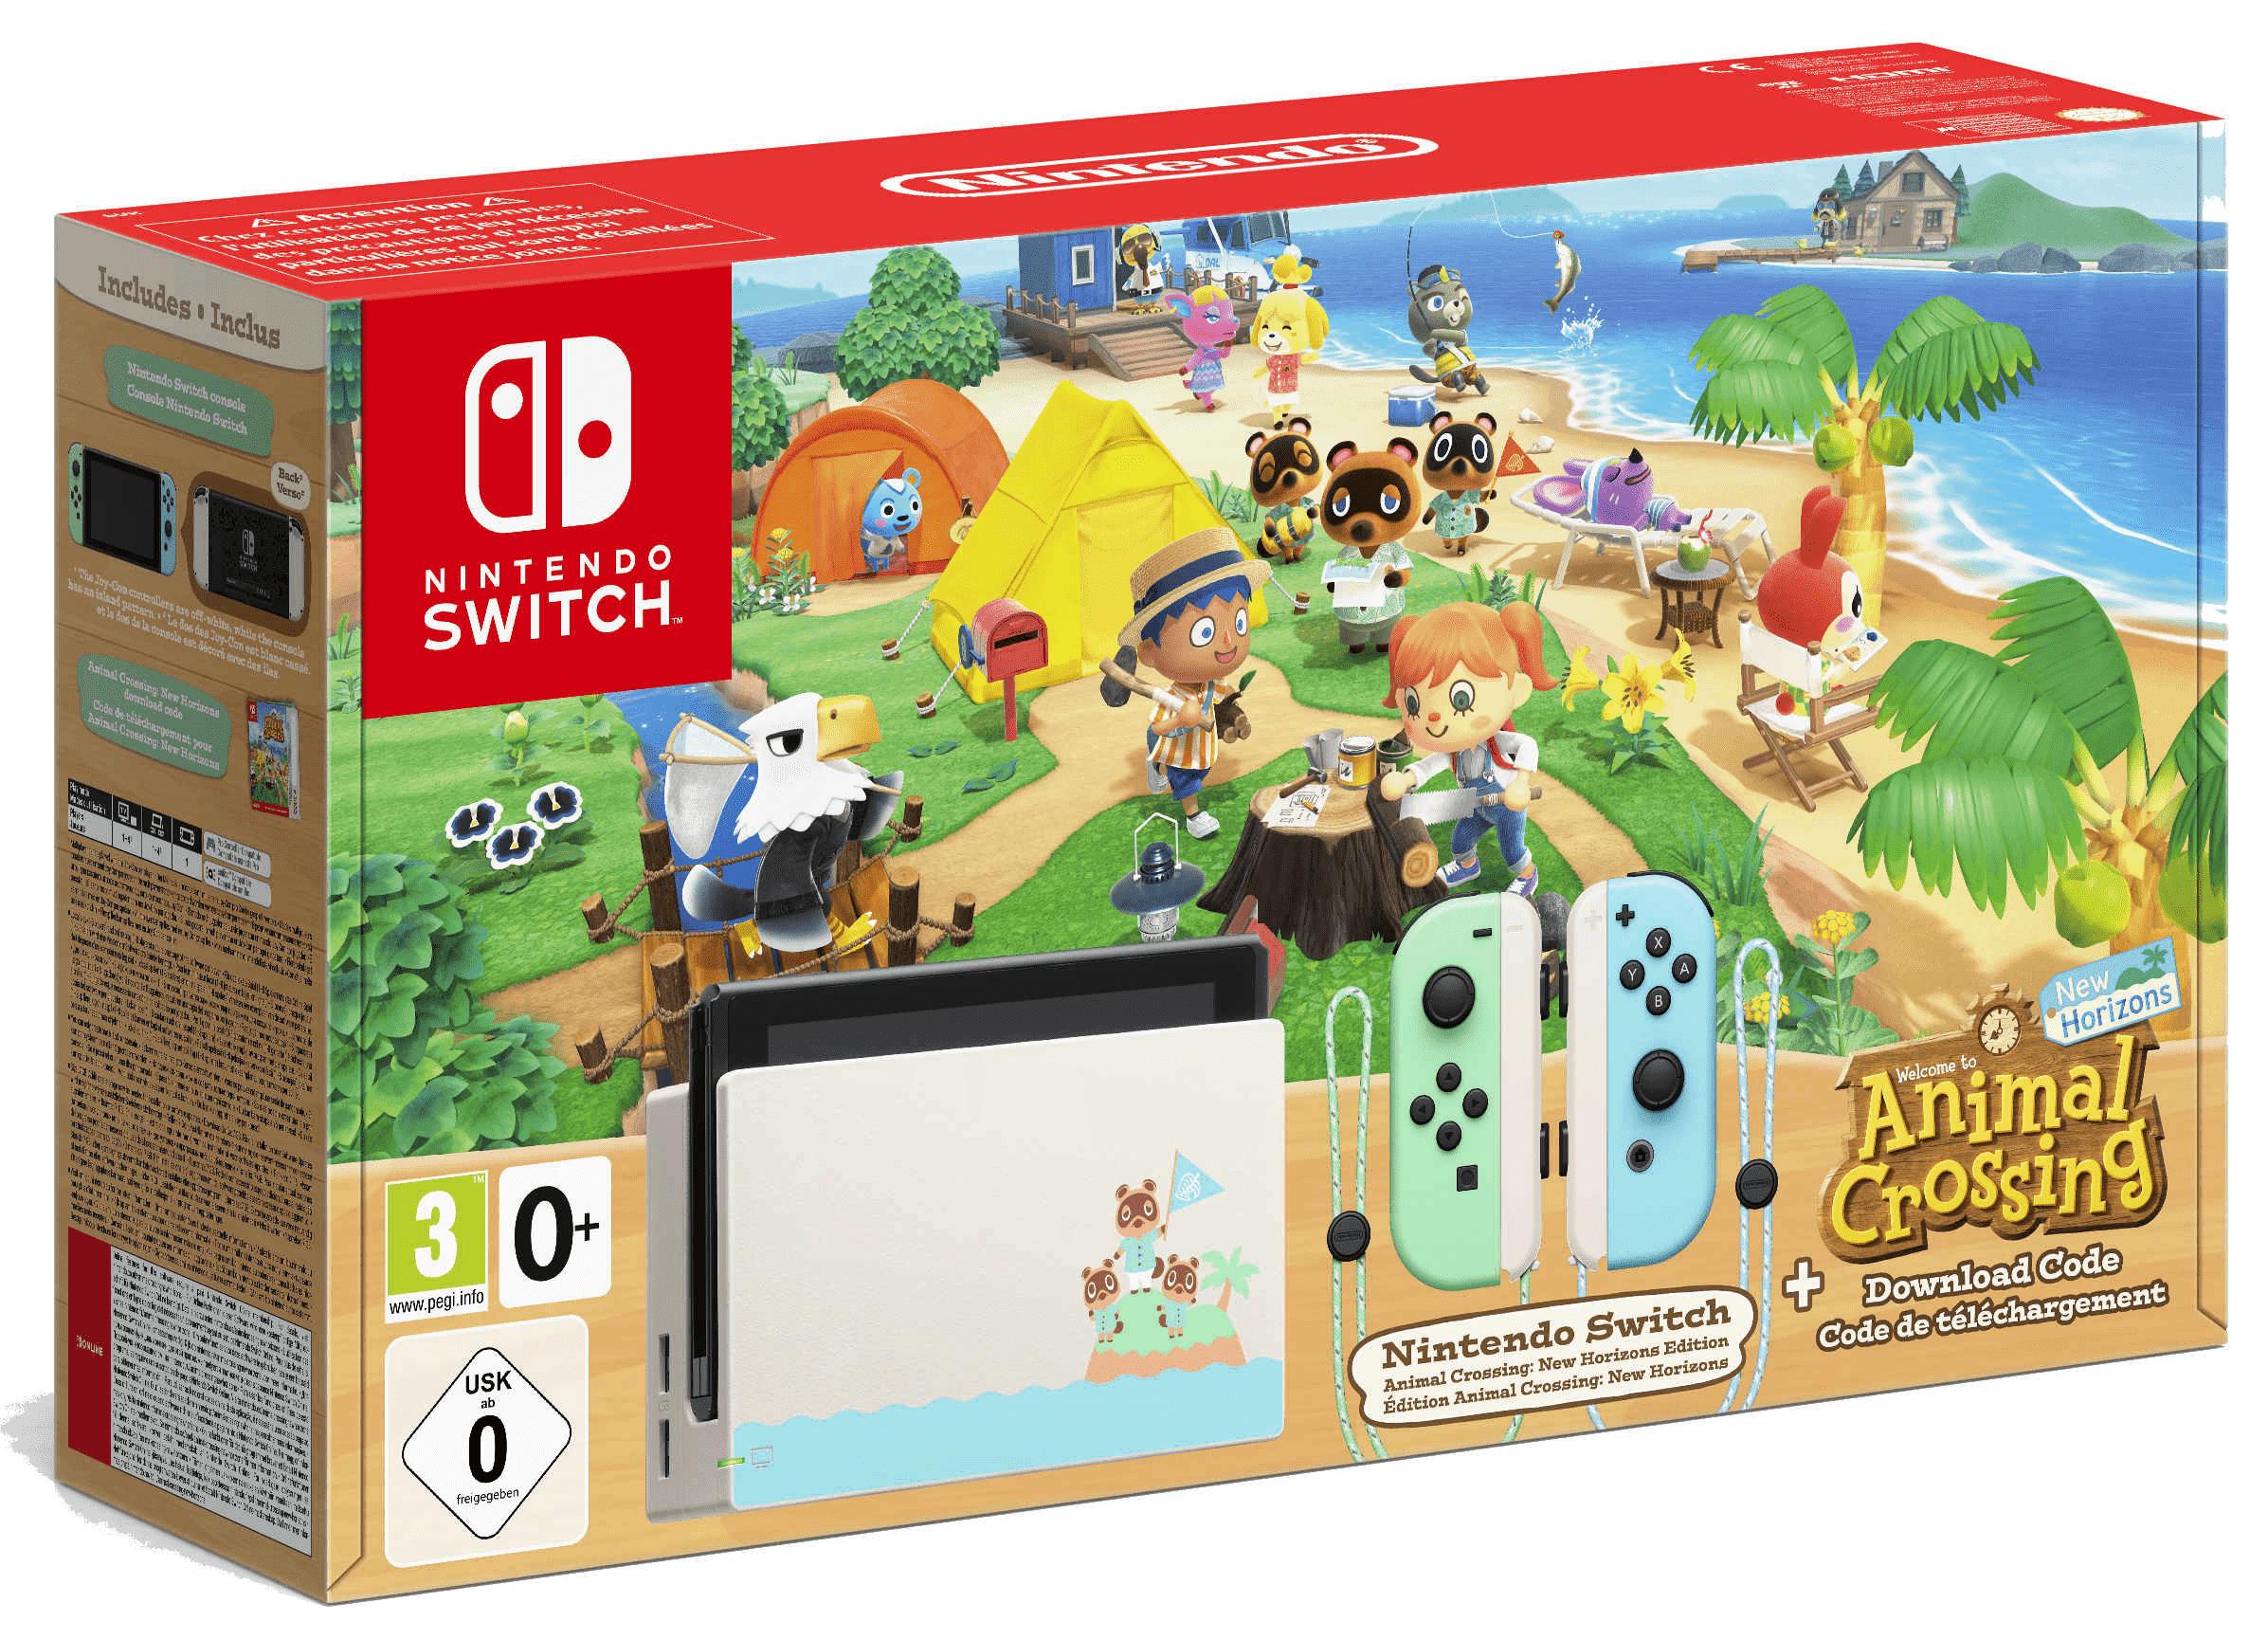 Nintendo Switch Animal Crossing New Horizons Edition für 109,95 ZZ mit mobilcom-debitel Vodafone green LTE (18GB LTE, 50 Mbit/s) mtl. 24,99€